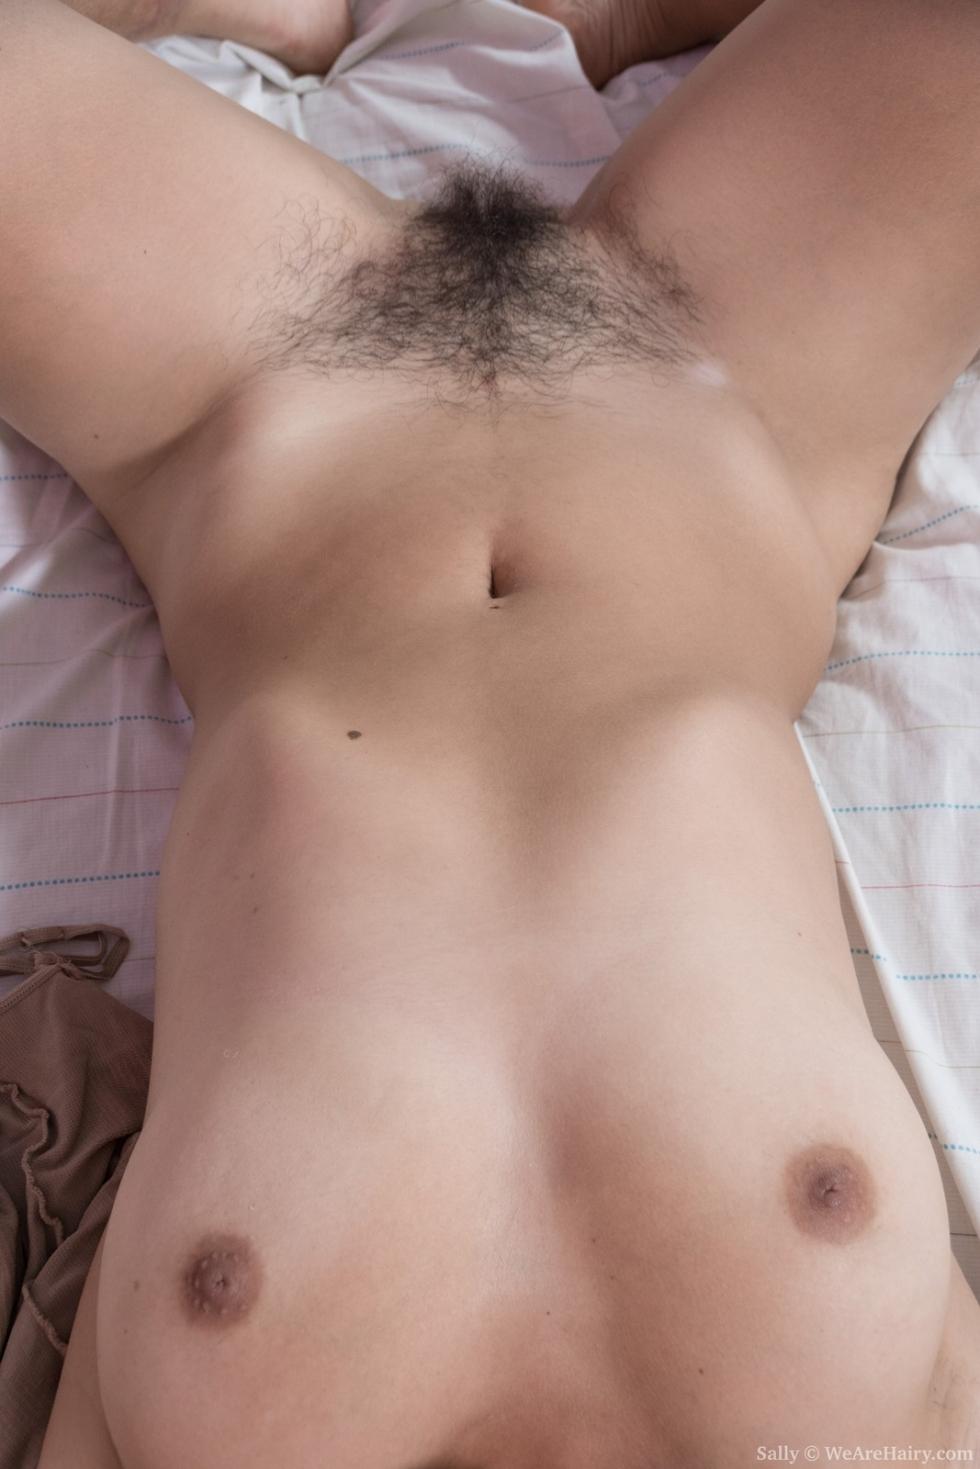 Shivali masturbates with her new black vibrator 2